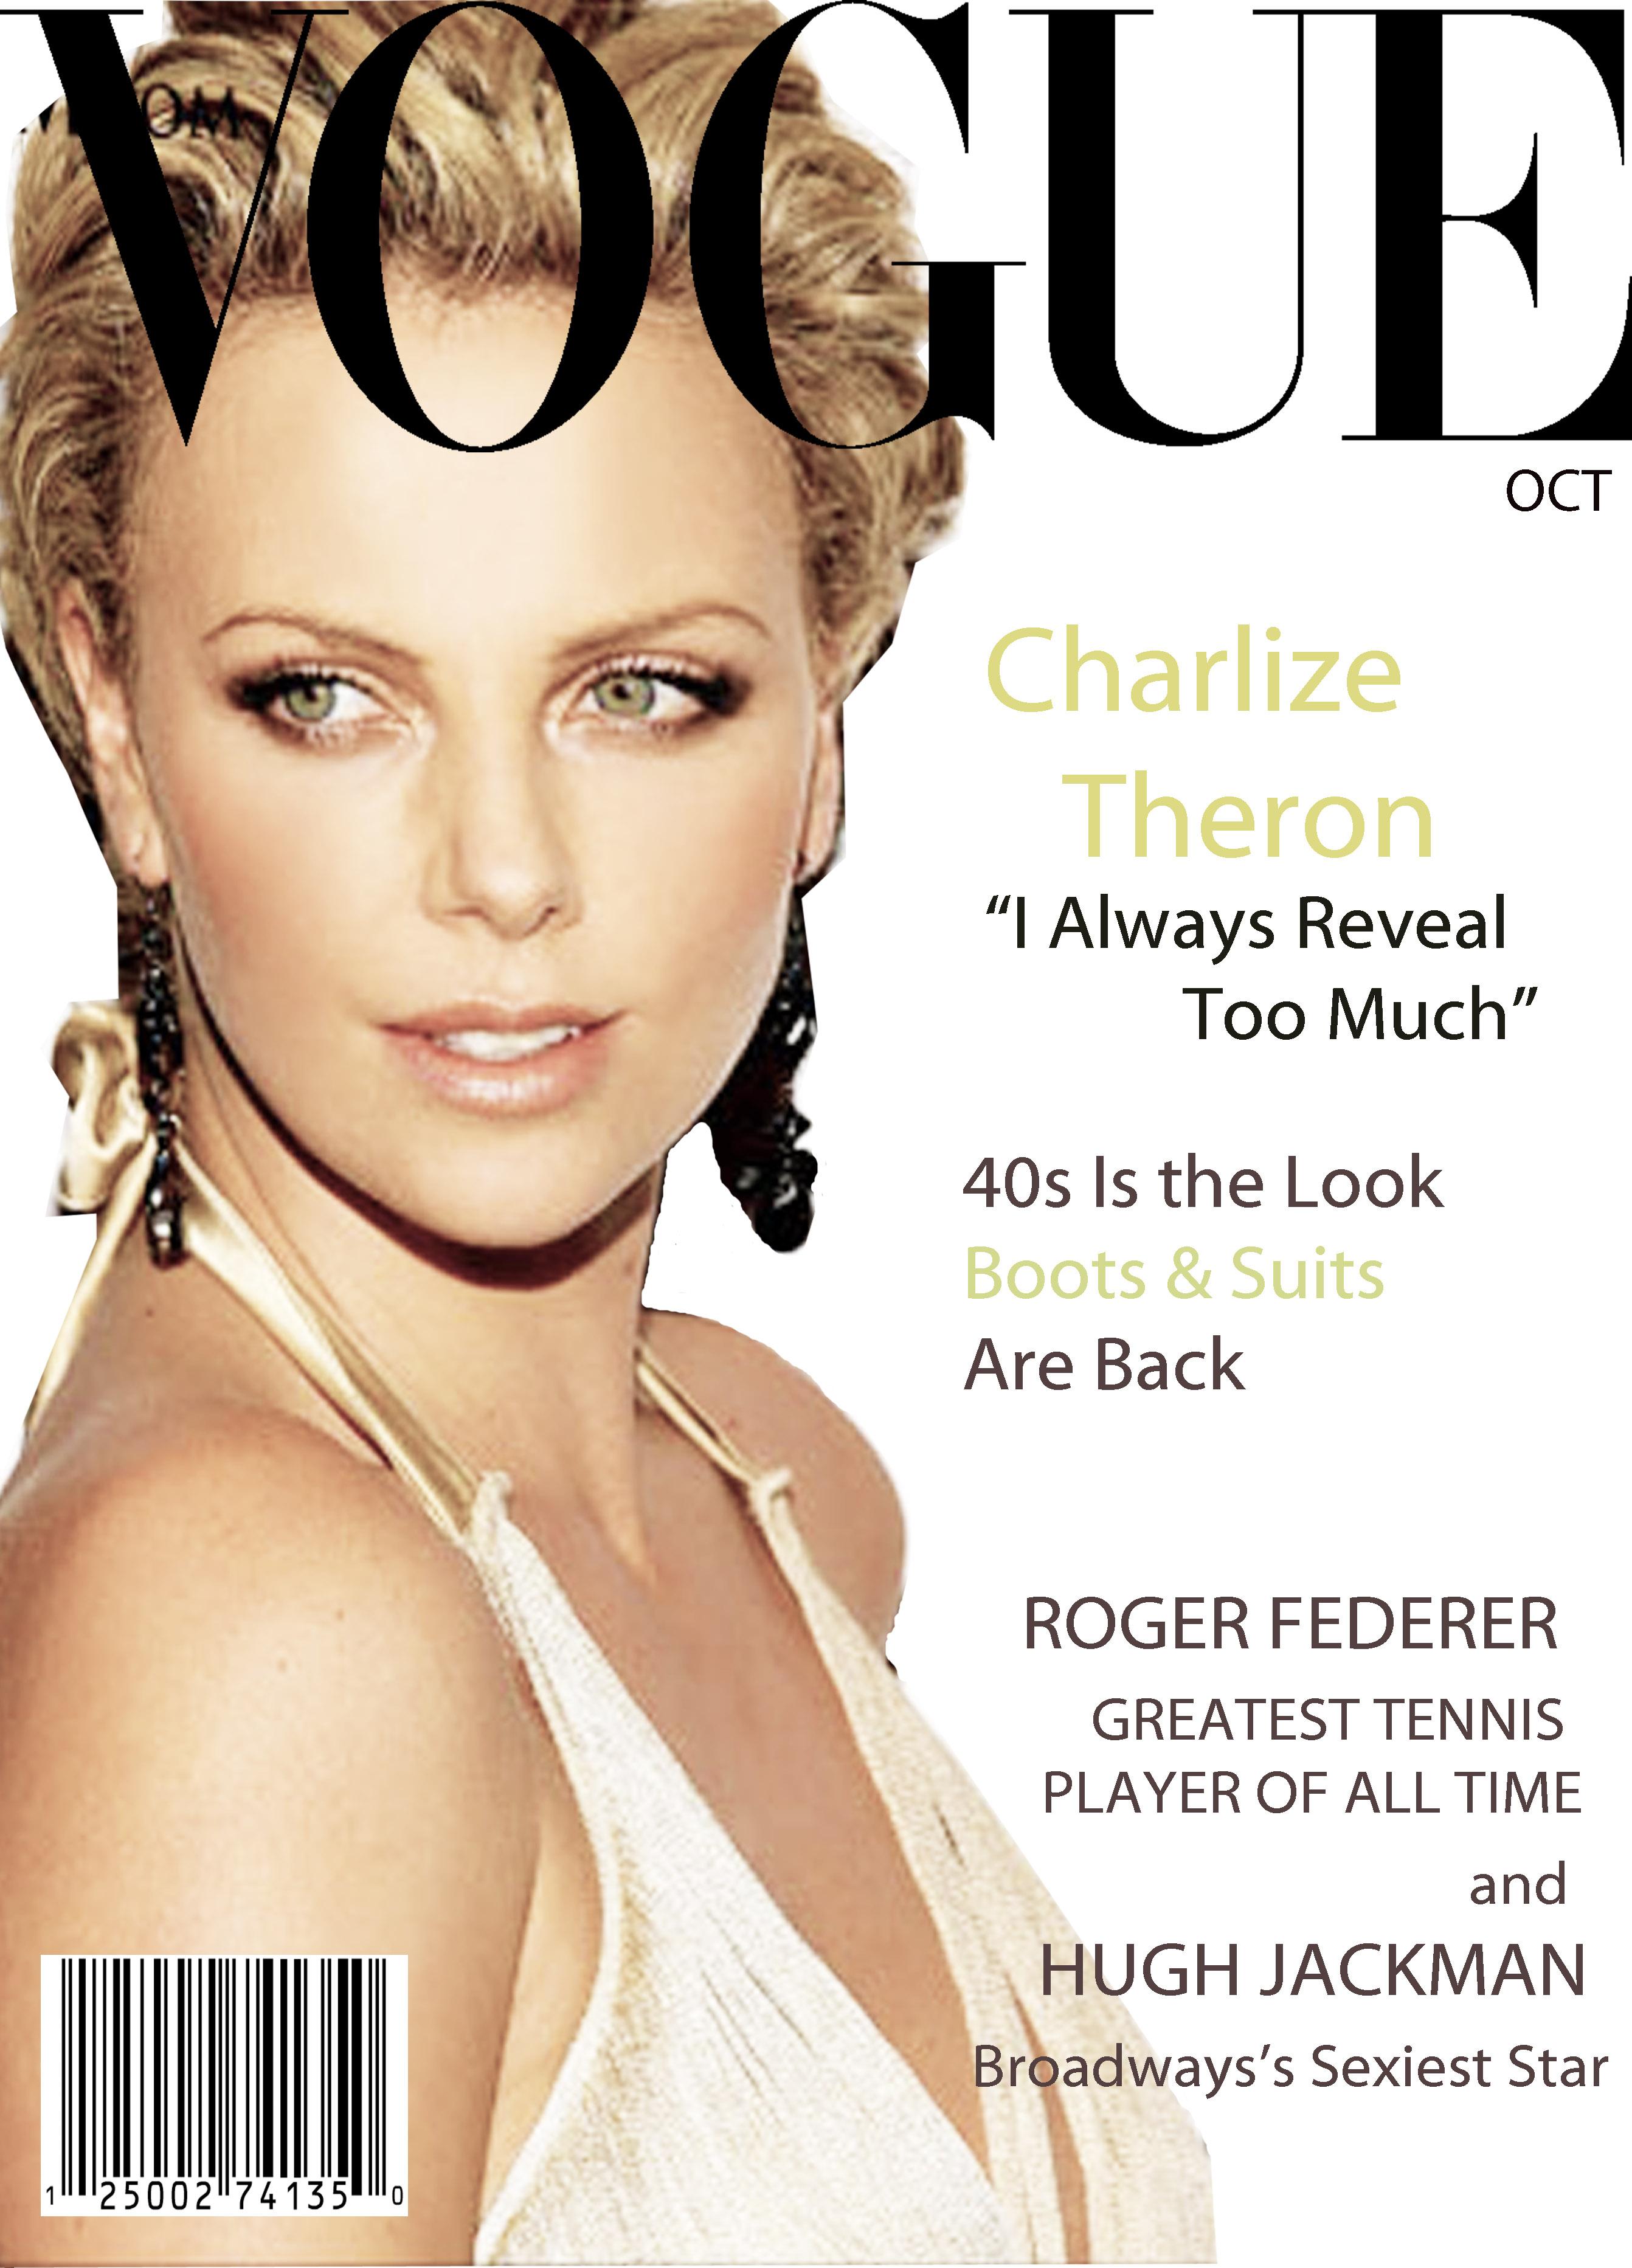 Vogue Wallpapers, Vogue Backgrounds, Vogue Images ...